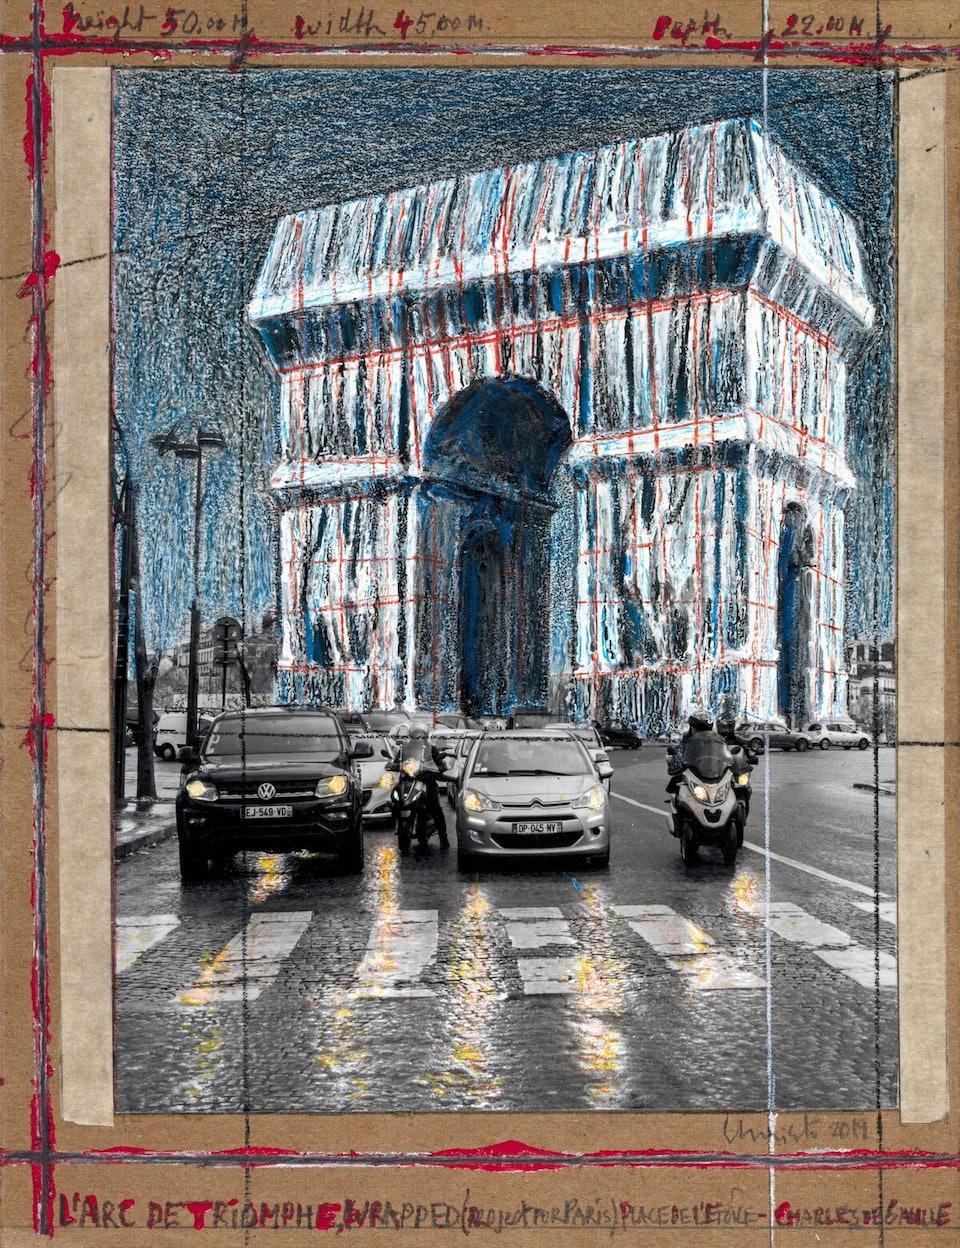 Arc-de-Triomphe_André Grossmann_ Христо Явашев Триумфальная арка